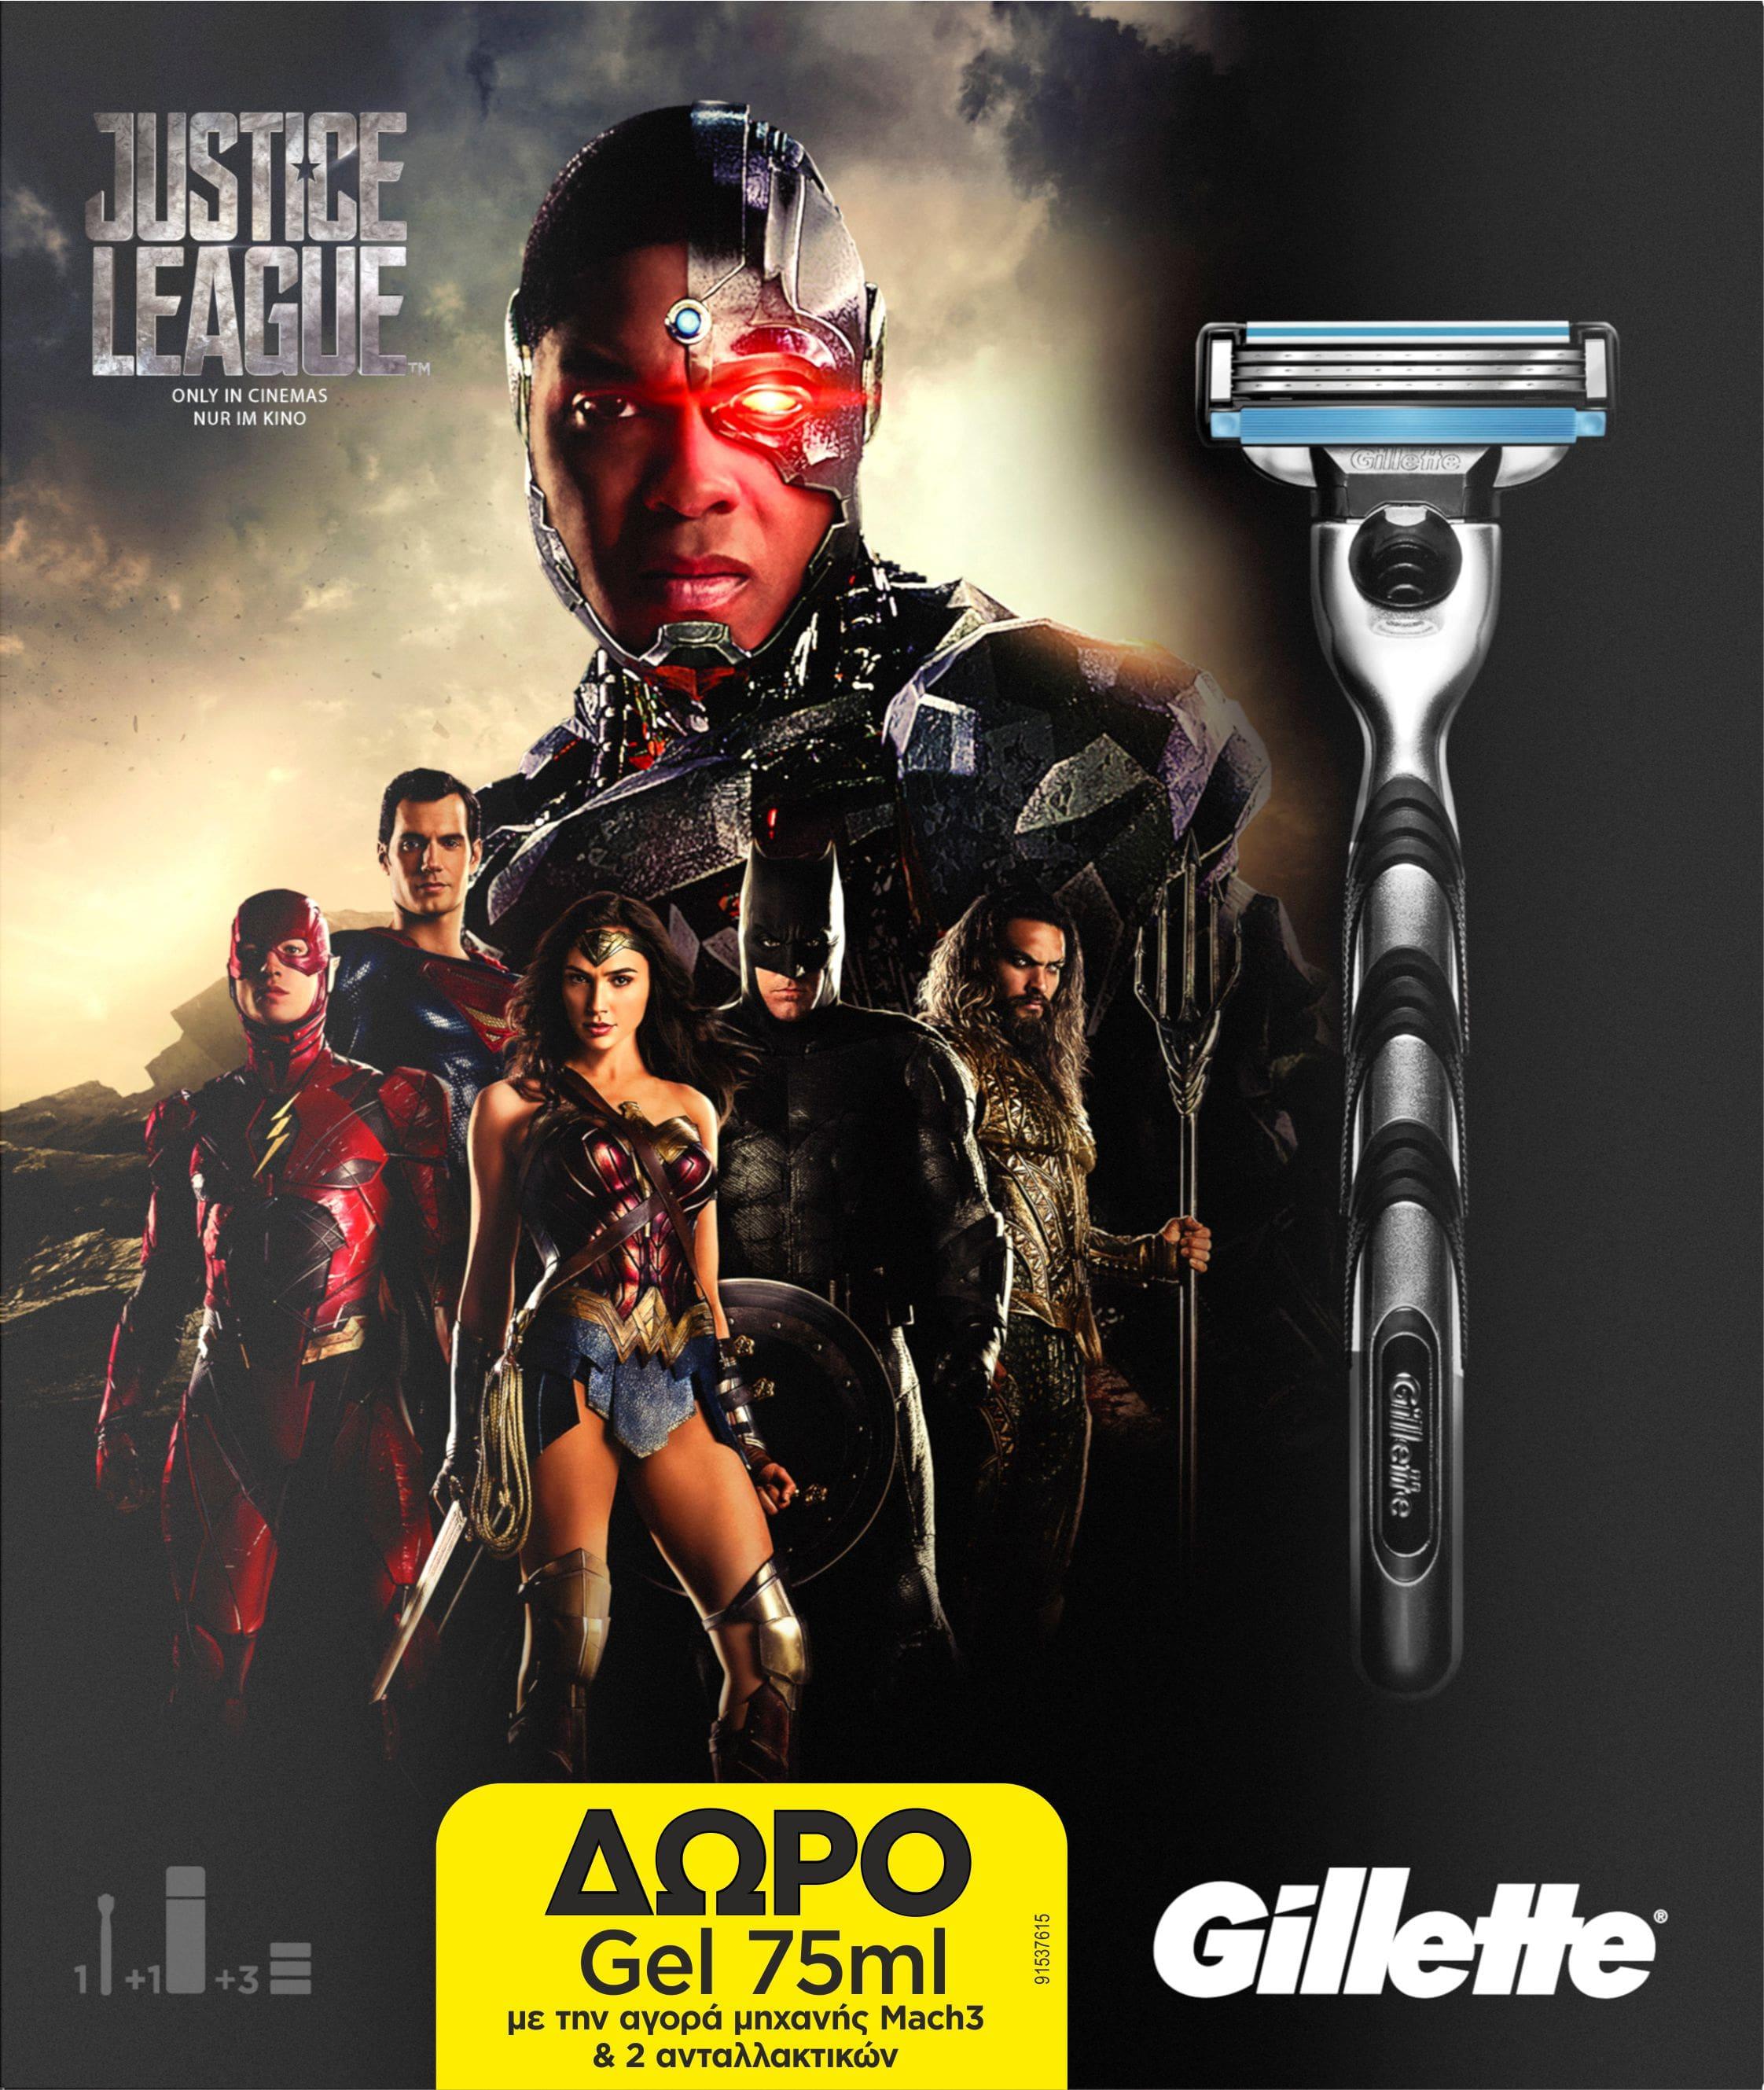 Gillette Justice League Limited Edition Mach3 Σετ Δώρου με Mach 3 Ξυριστική Μηχανή με 3 λεπτές λεπίδες & λιπαντική ταινία, 1 τεμάχιο & 2 Ανταλλακτικά & ΔΩΡΟ Mach 3 Complete Defense Τζελ Ξυρίσματος, 75ml